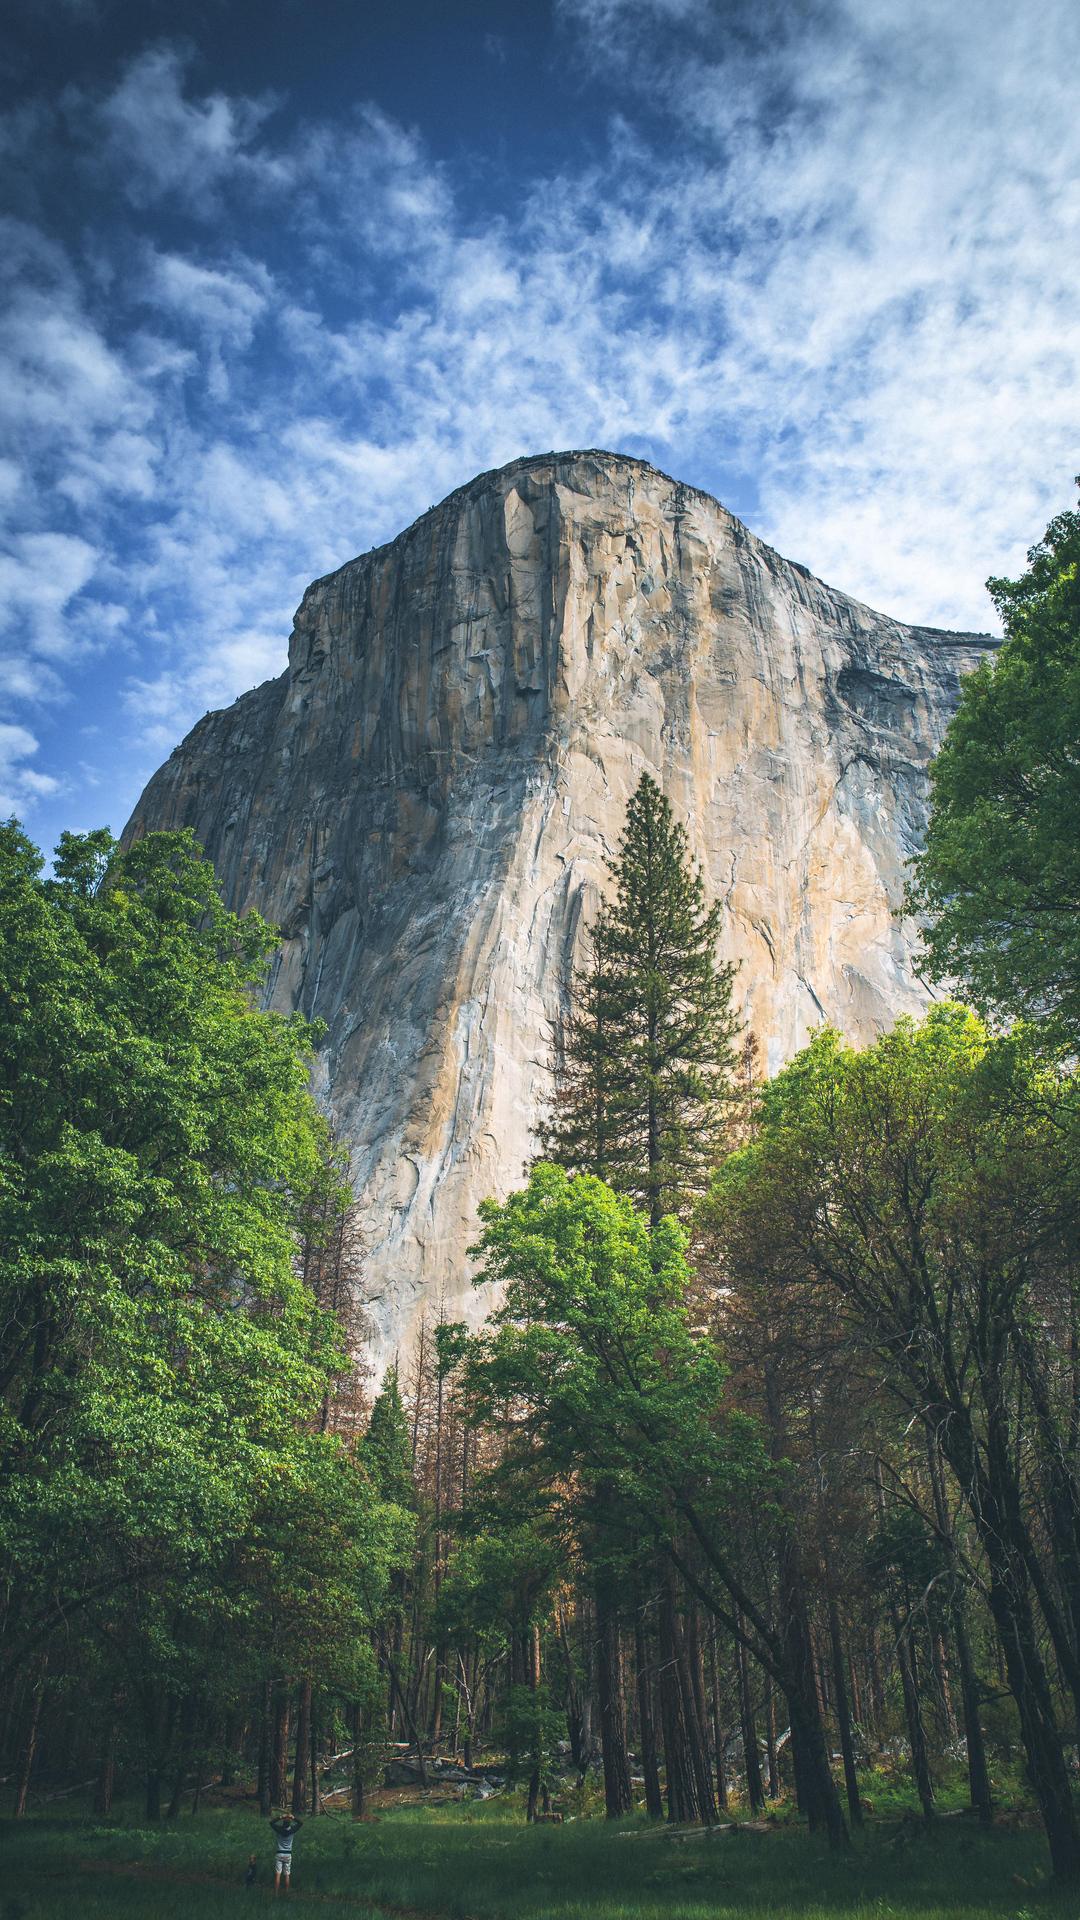 1080x1920 Yosemite 4k Iphone 7 6s 6 Plus Pixel Xl One Plus